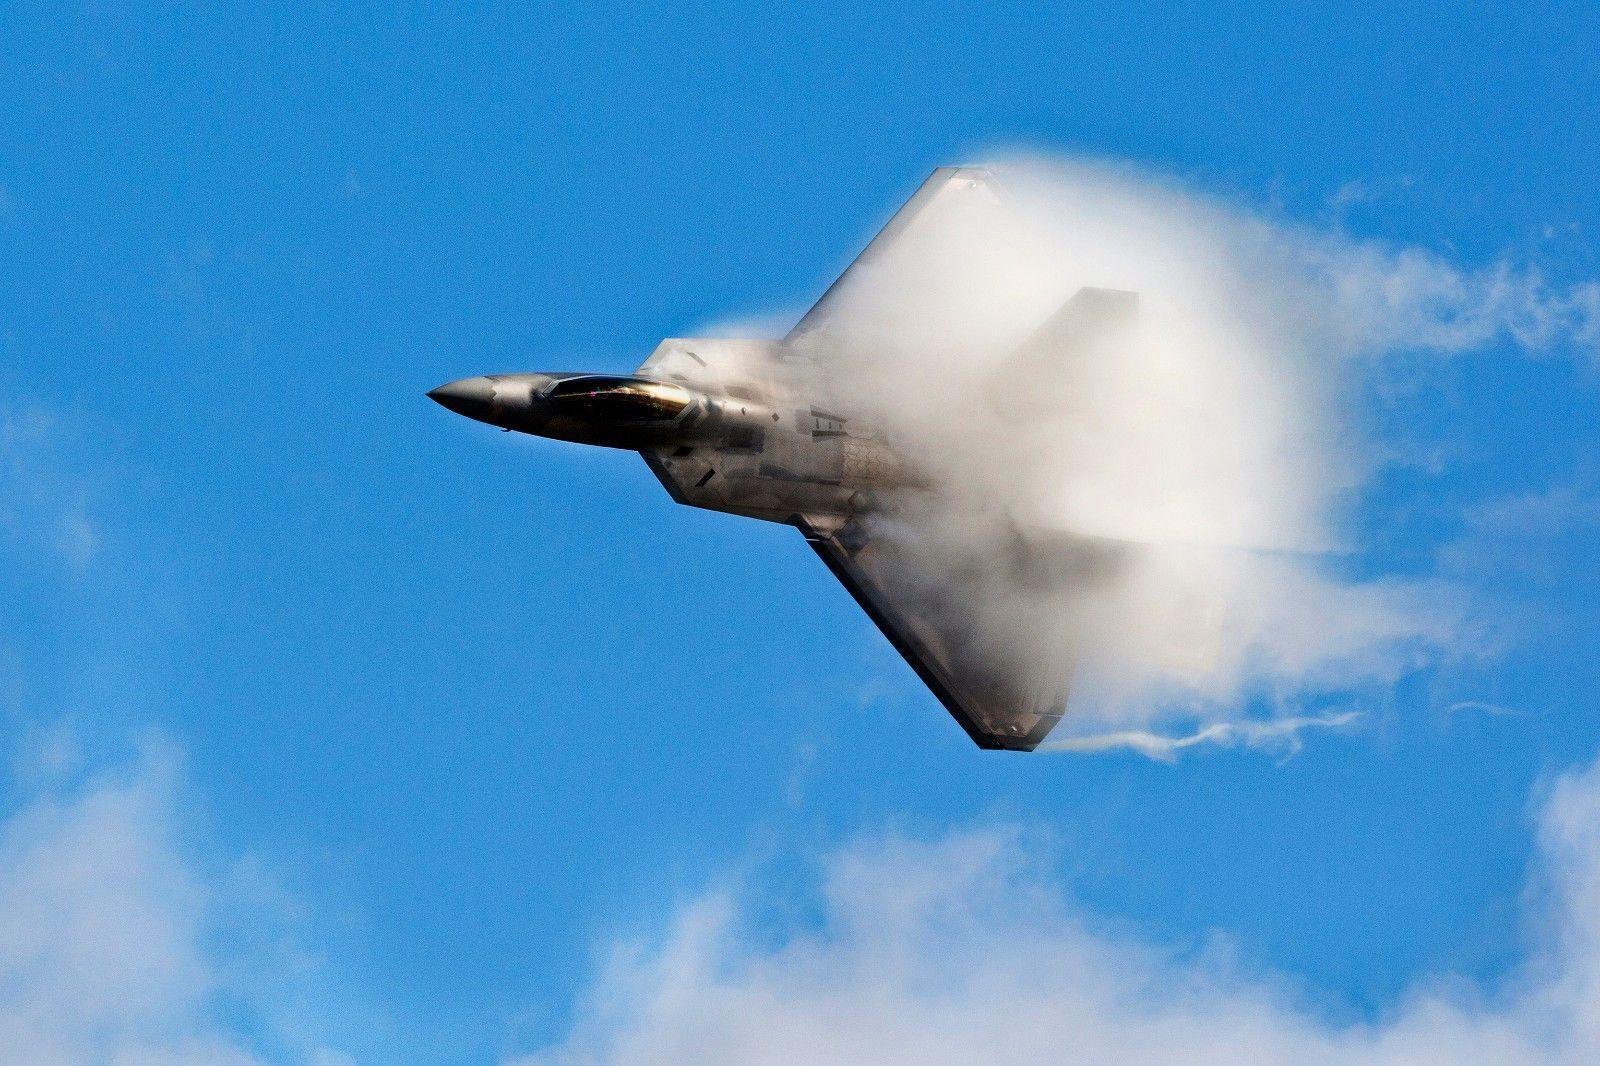 Air Force LOW-0296